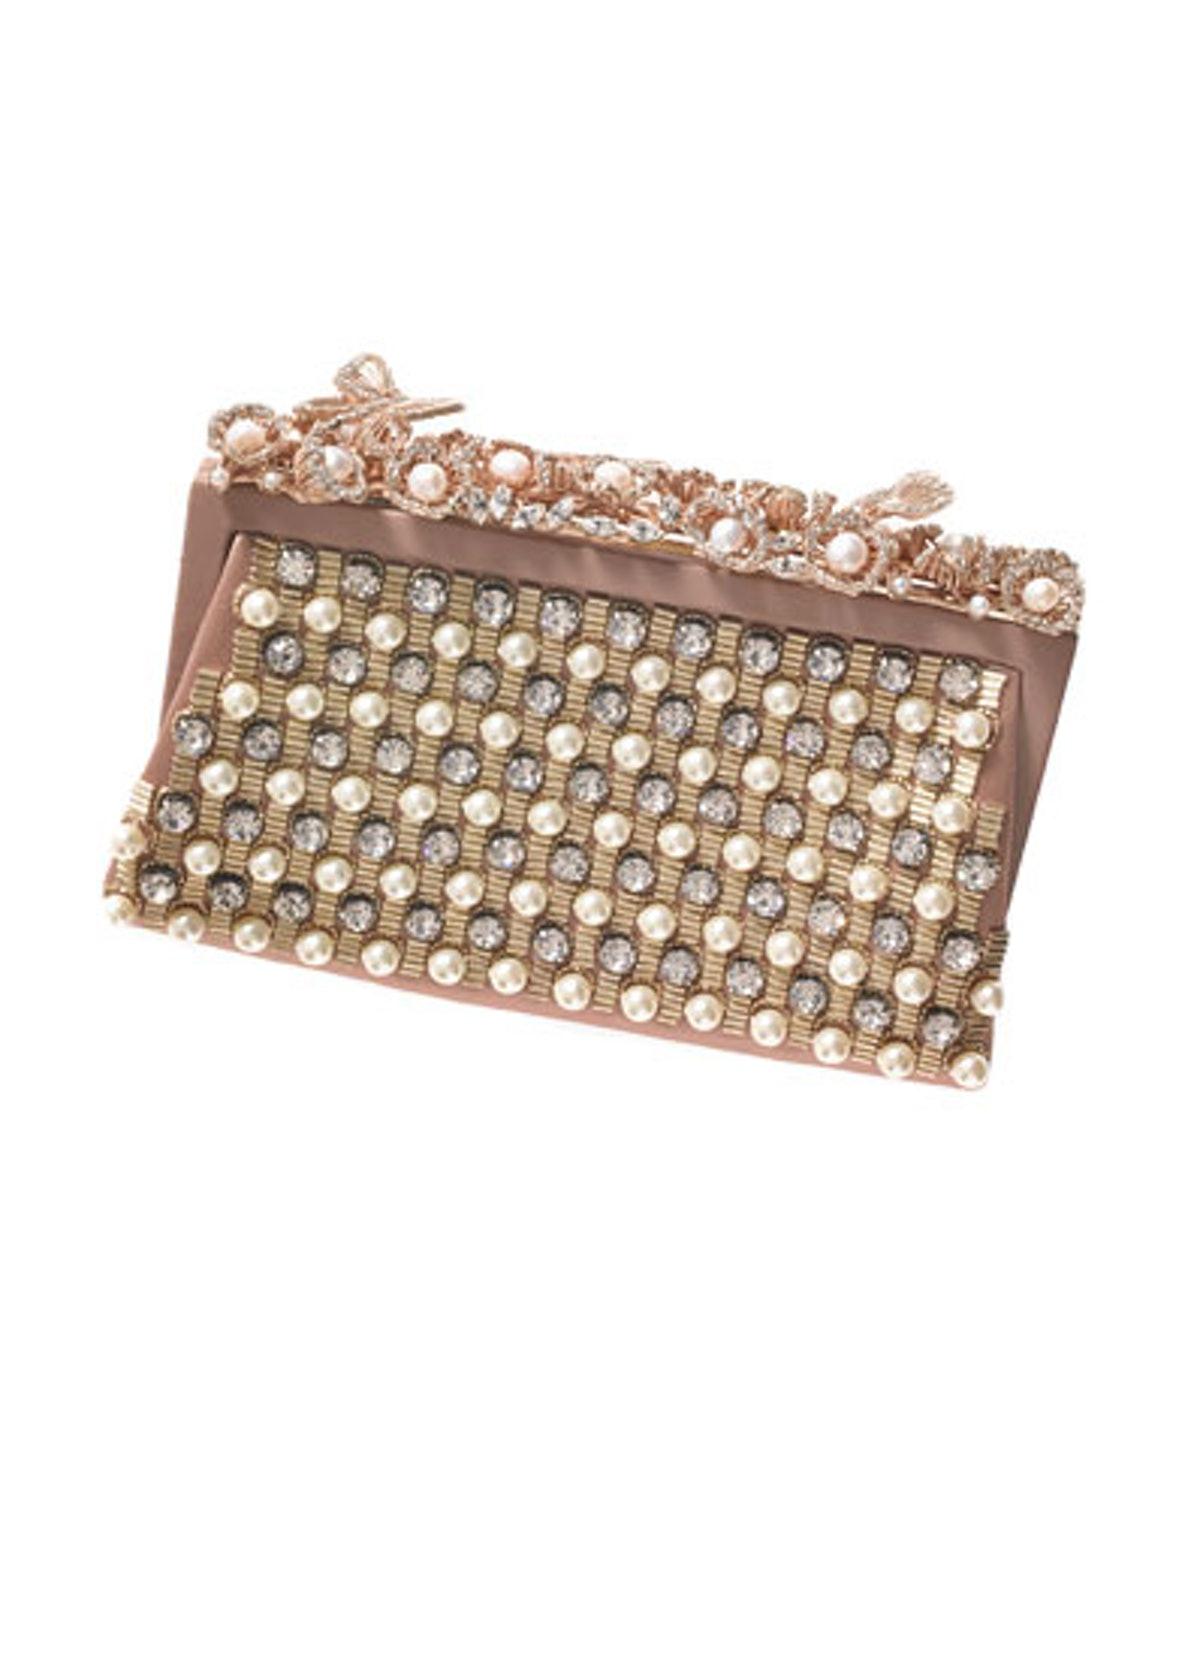 acss-baroque-accessories-01-v.jpg